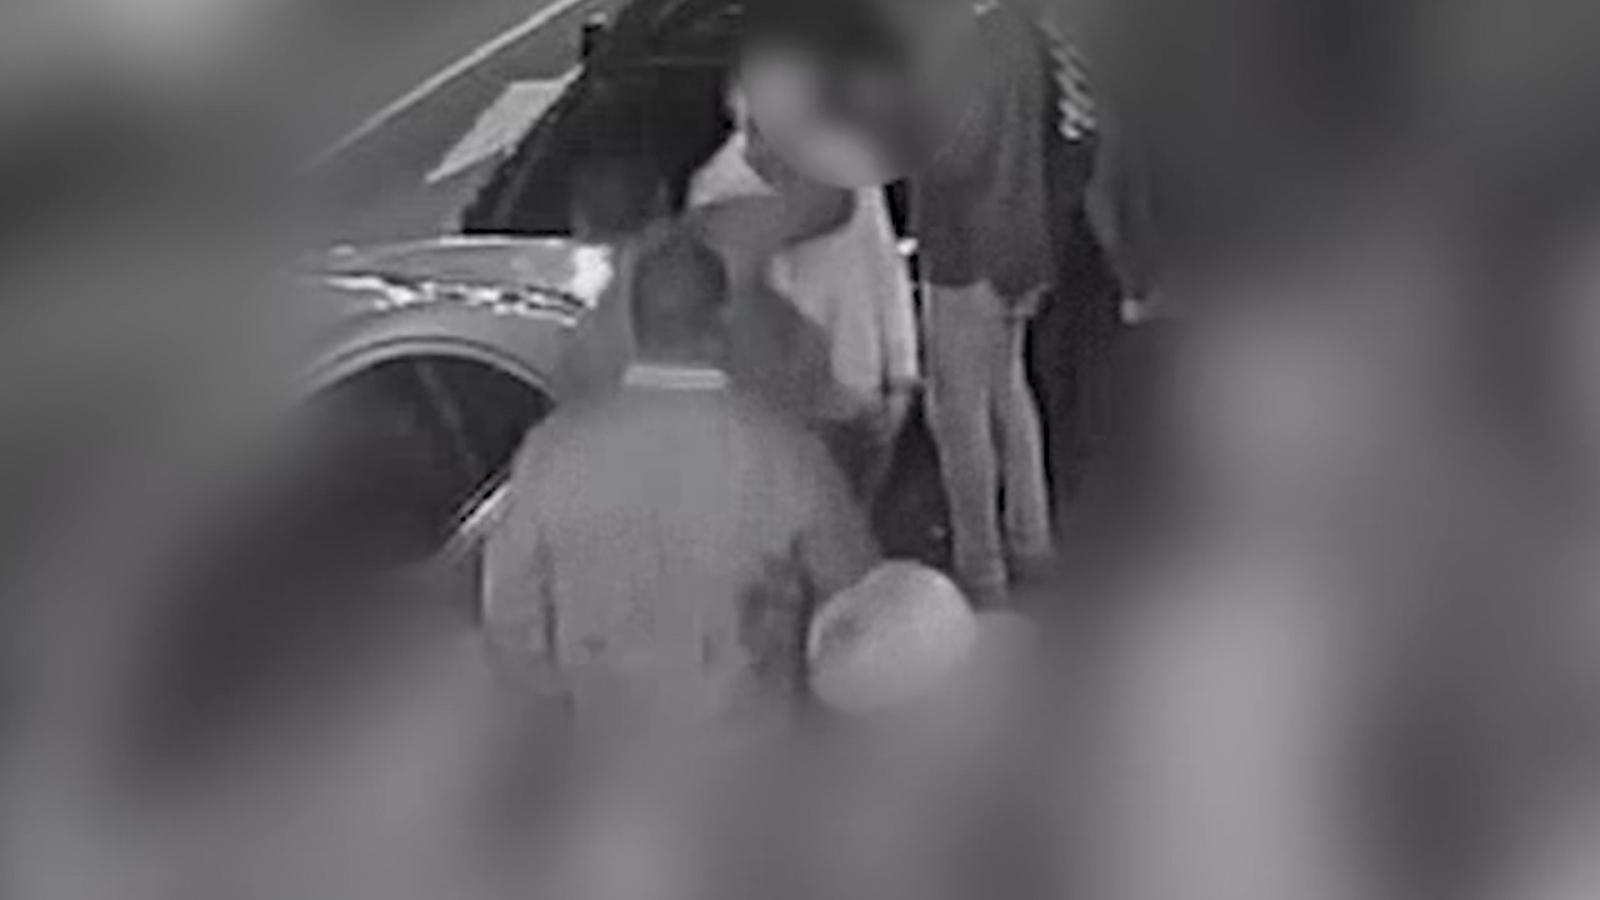 CCTV shows vicious unprovoked attack in London